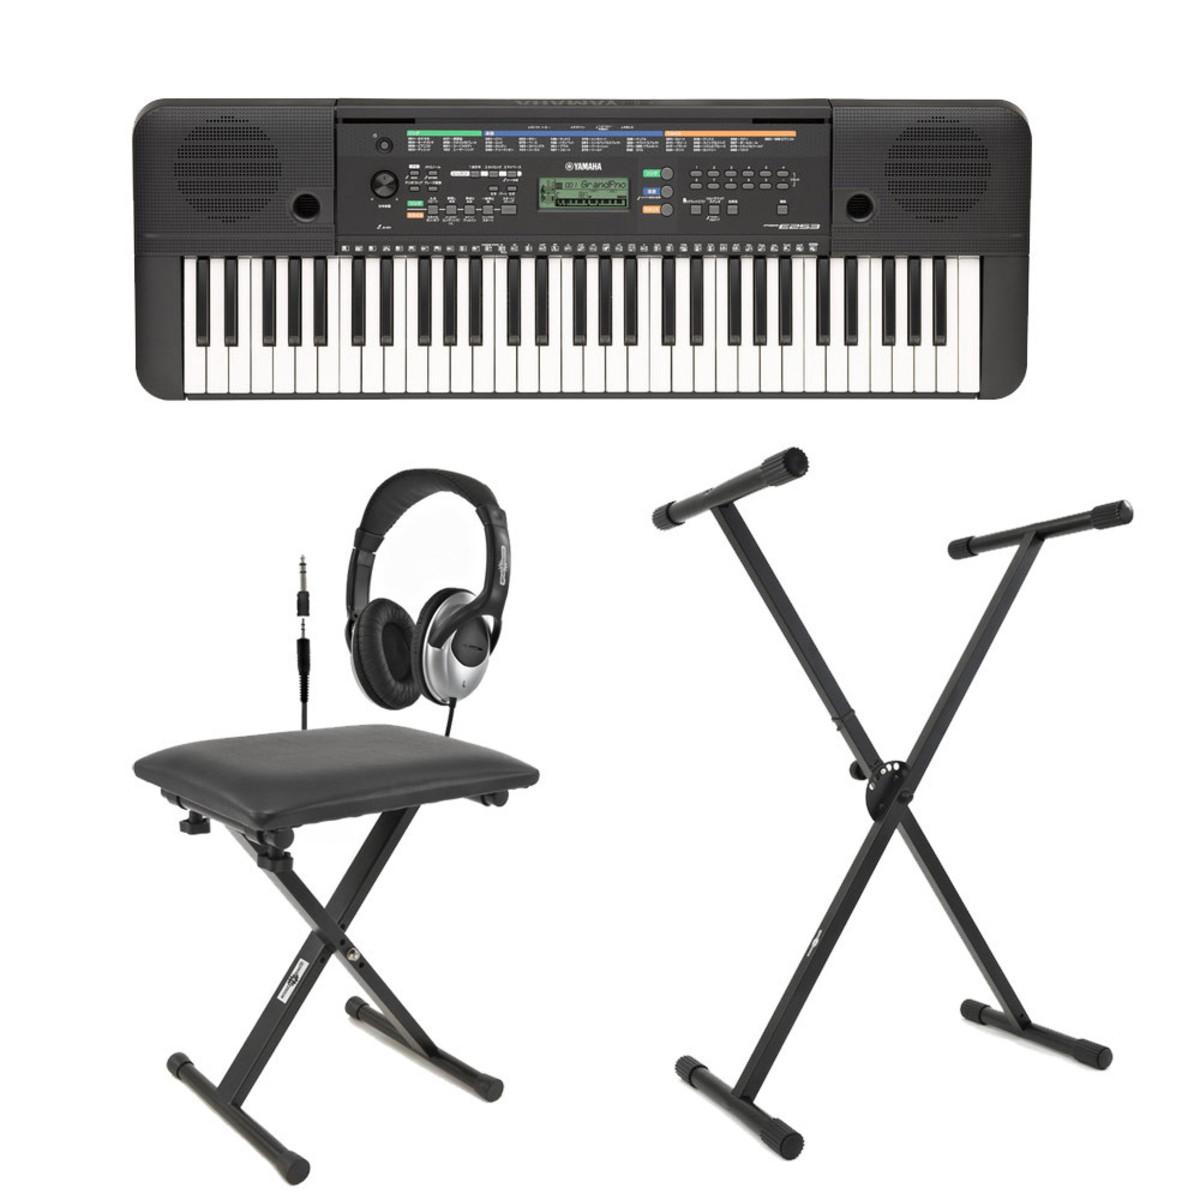 Yamaha psr e253 portable keyboard with stand bench and for Yamaha psr stand